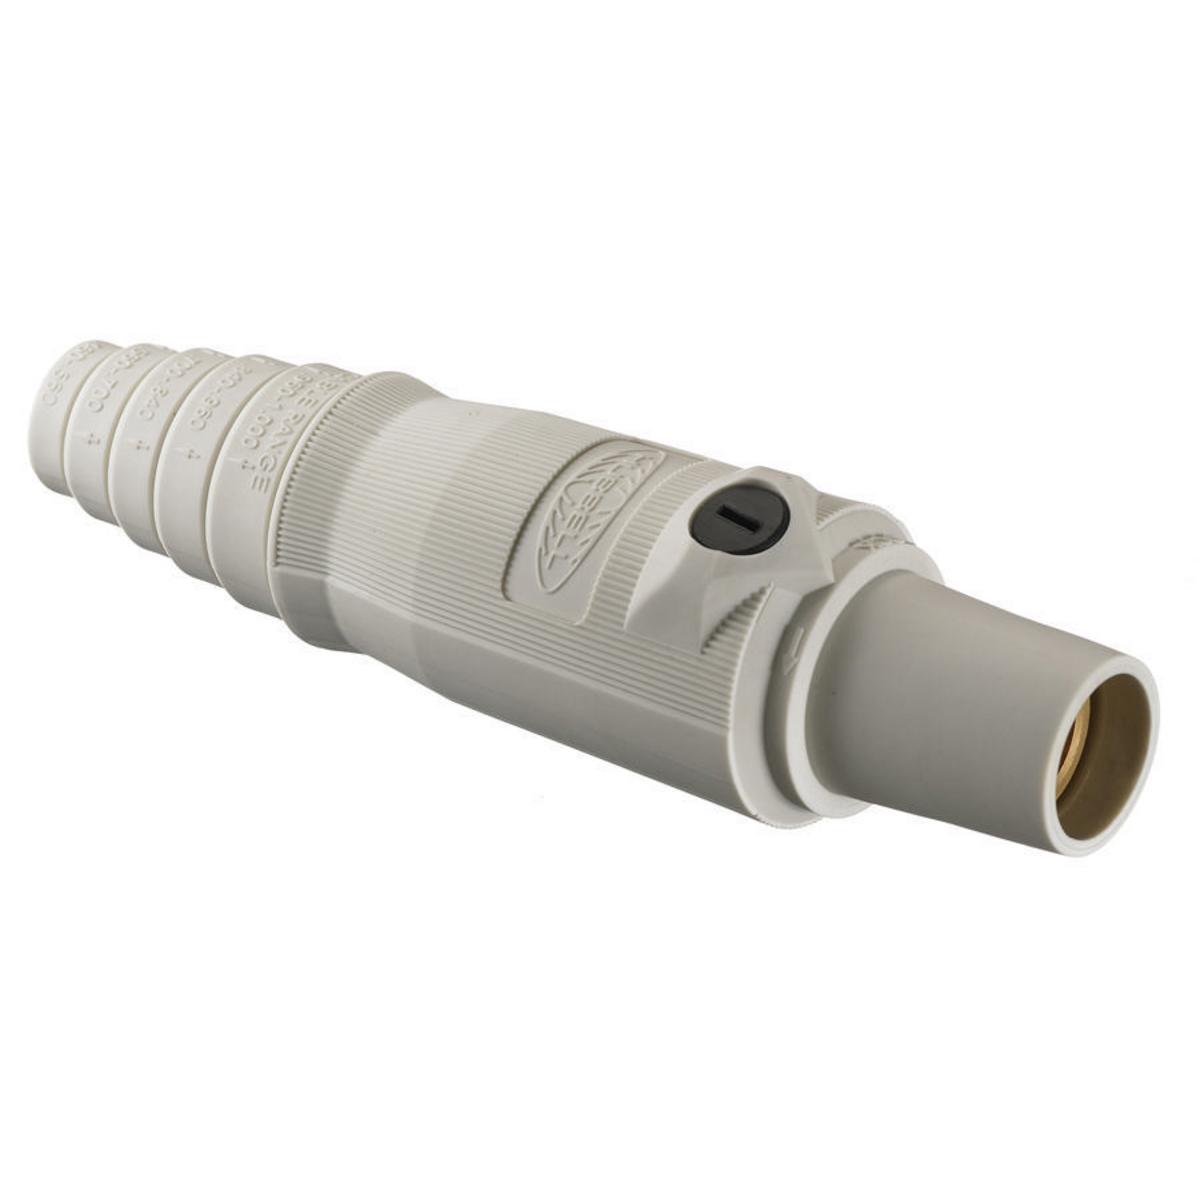 Hubbell HBL300FW 300 Amp White FeMale Plug